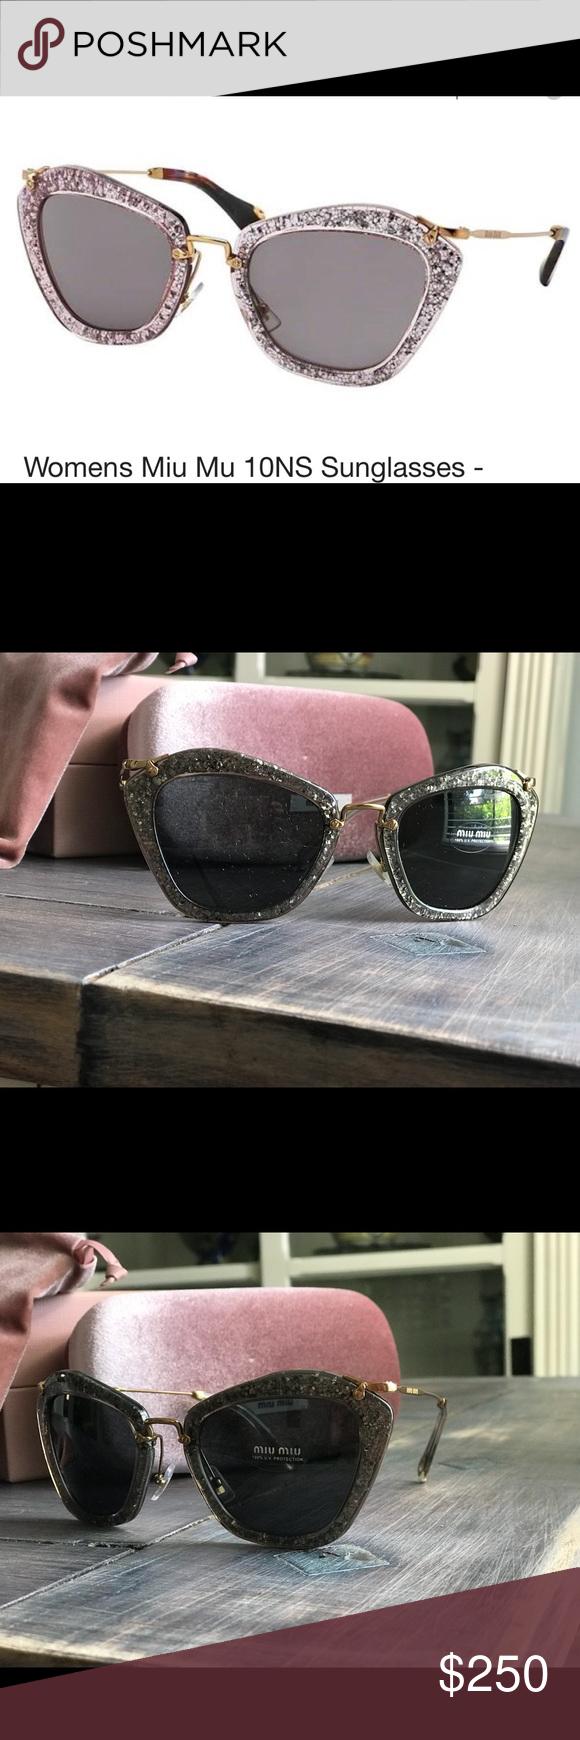 d60e605a56684 MIU MIU NOIR MU10NS Grey Smoke Glitter Gold Sunglasses 10N Geometric  Mirrored